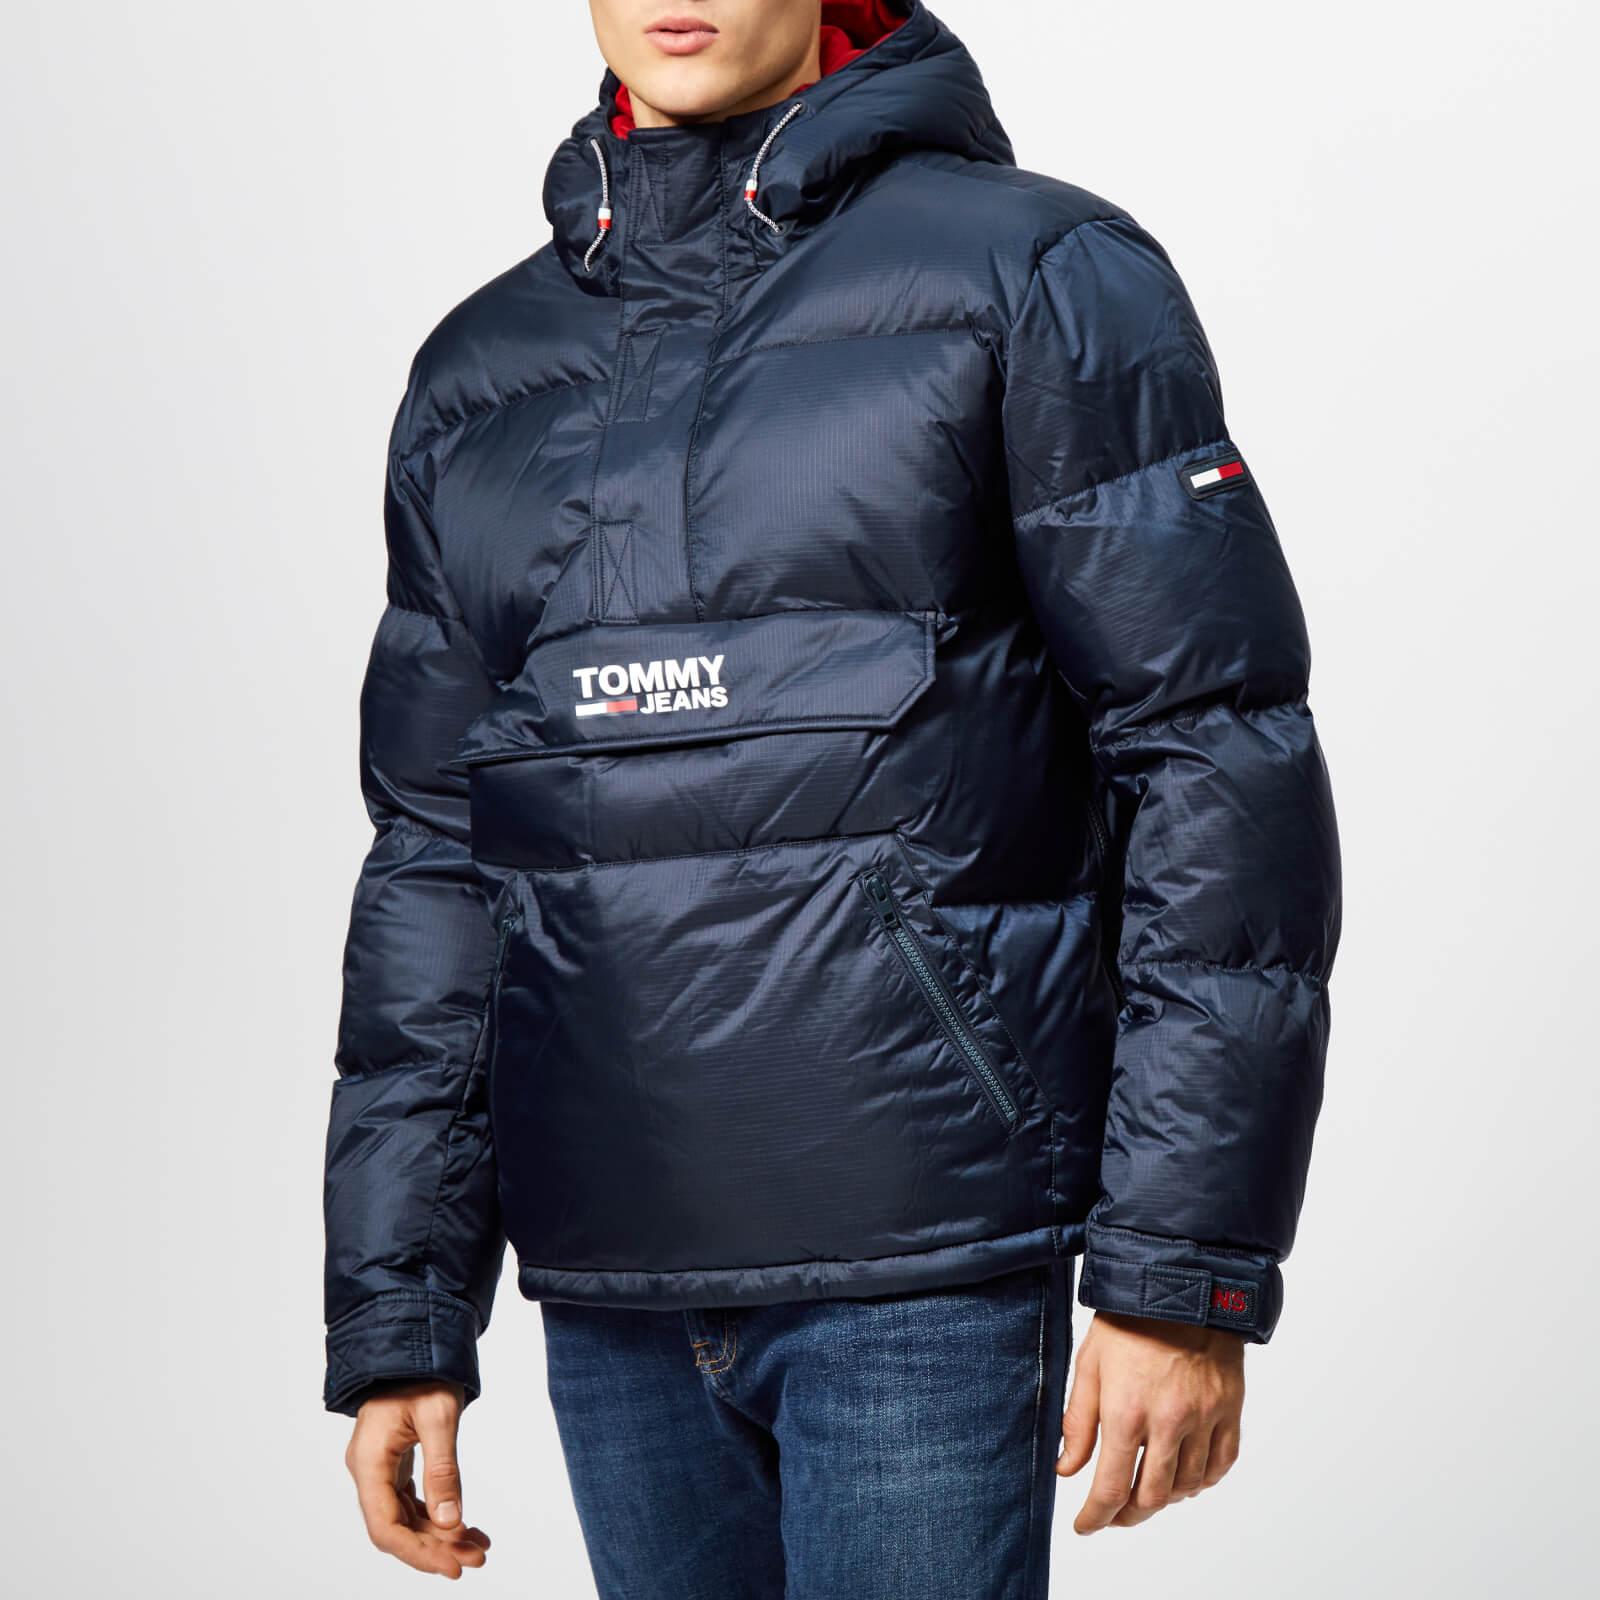 6df657cc9 Tommy Jeans Men's TJM Padded Popover Jacket - Black Iris Clothing ...